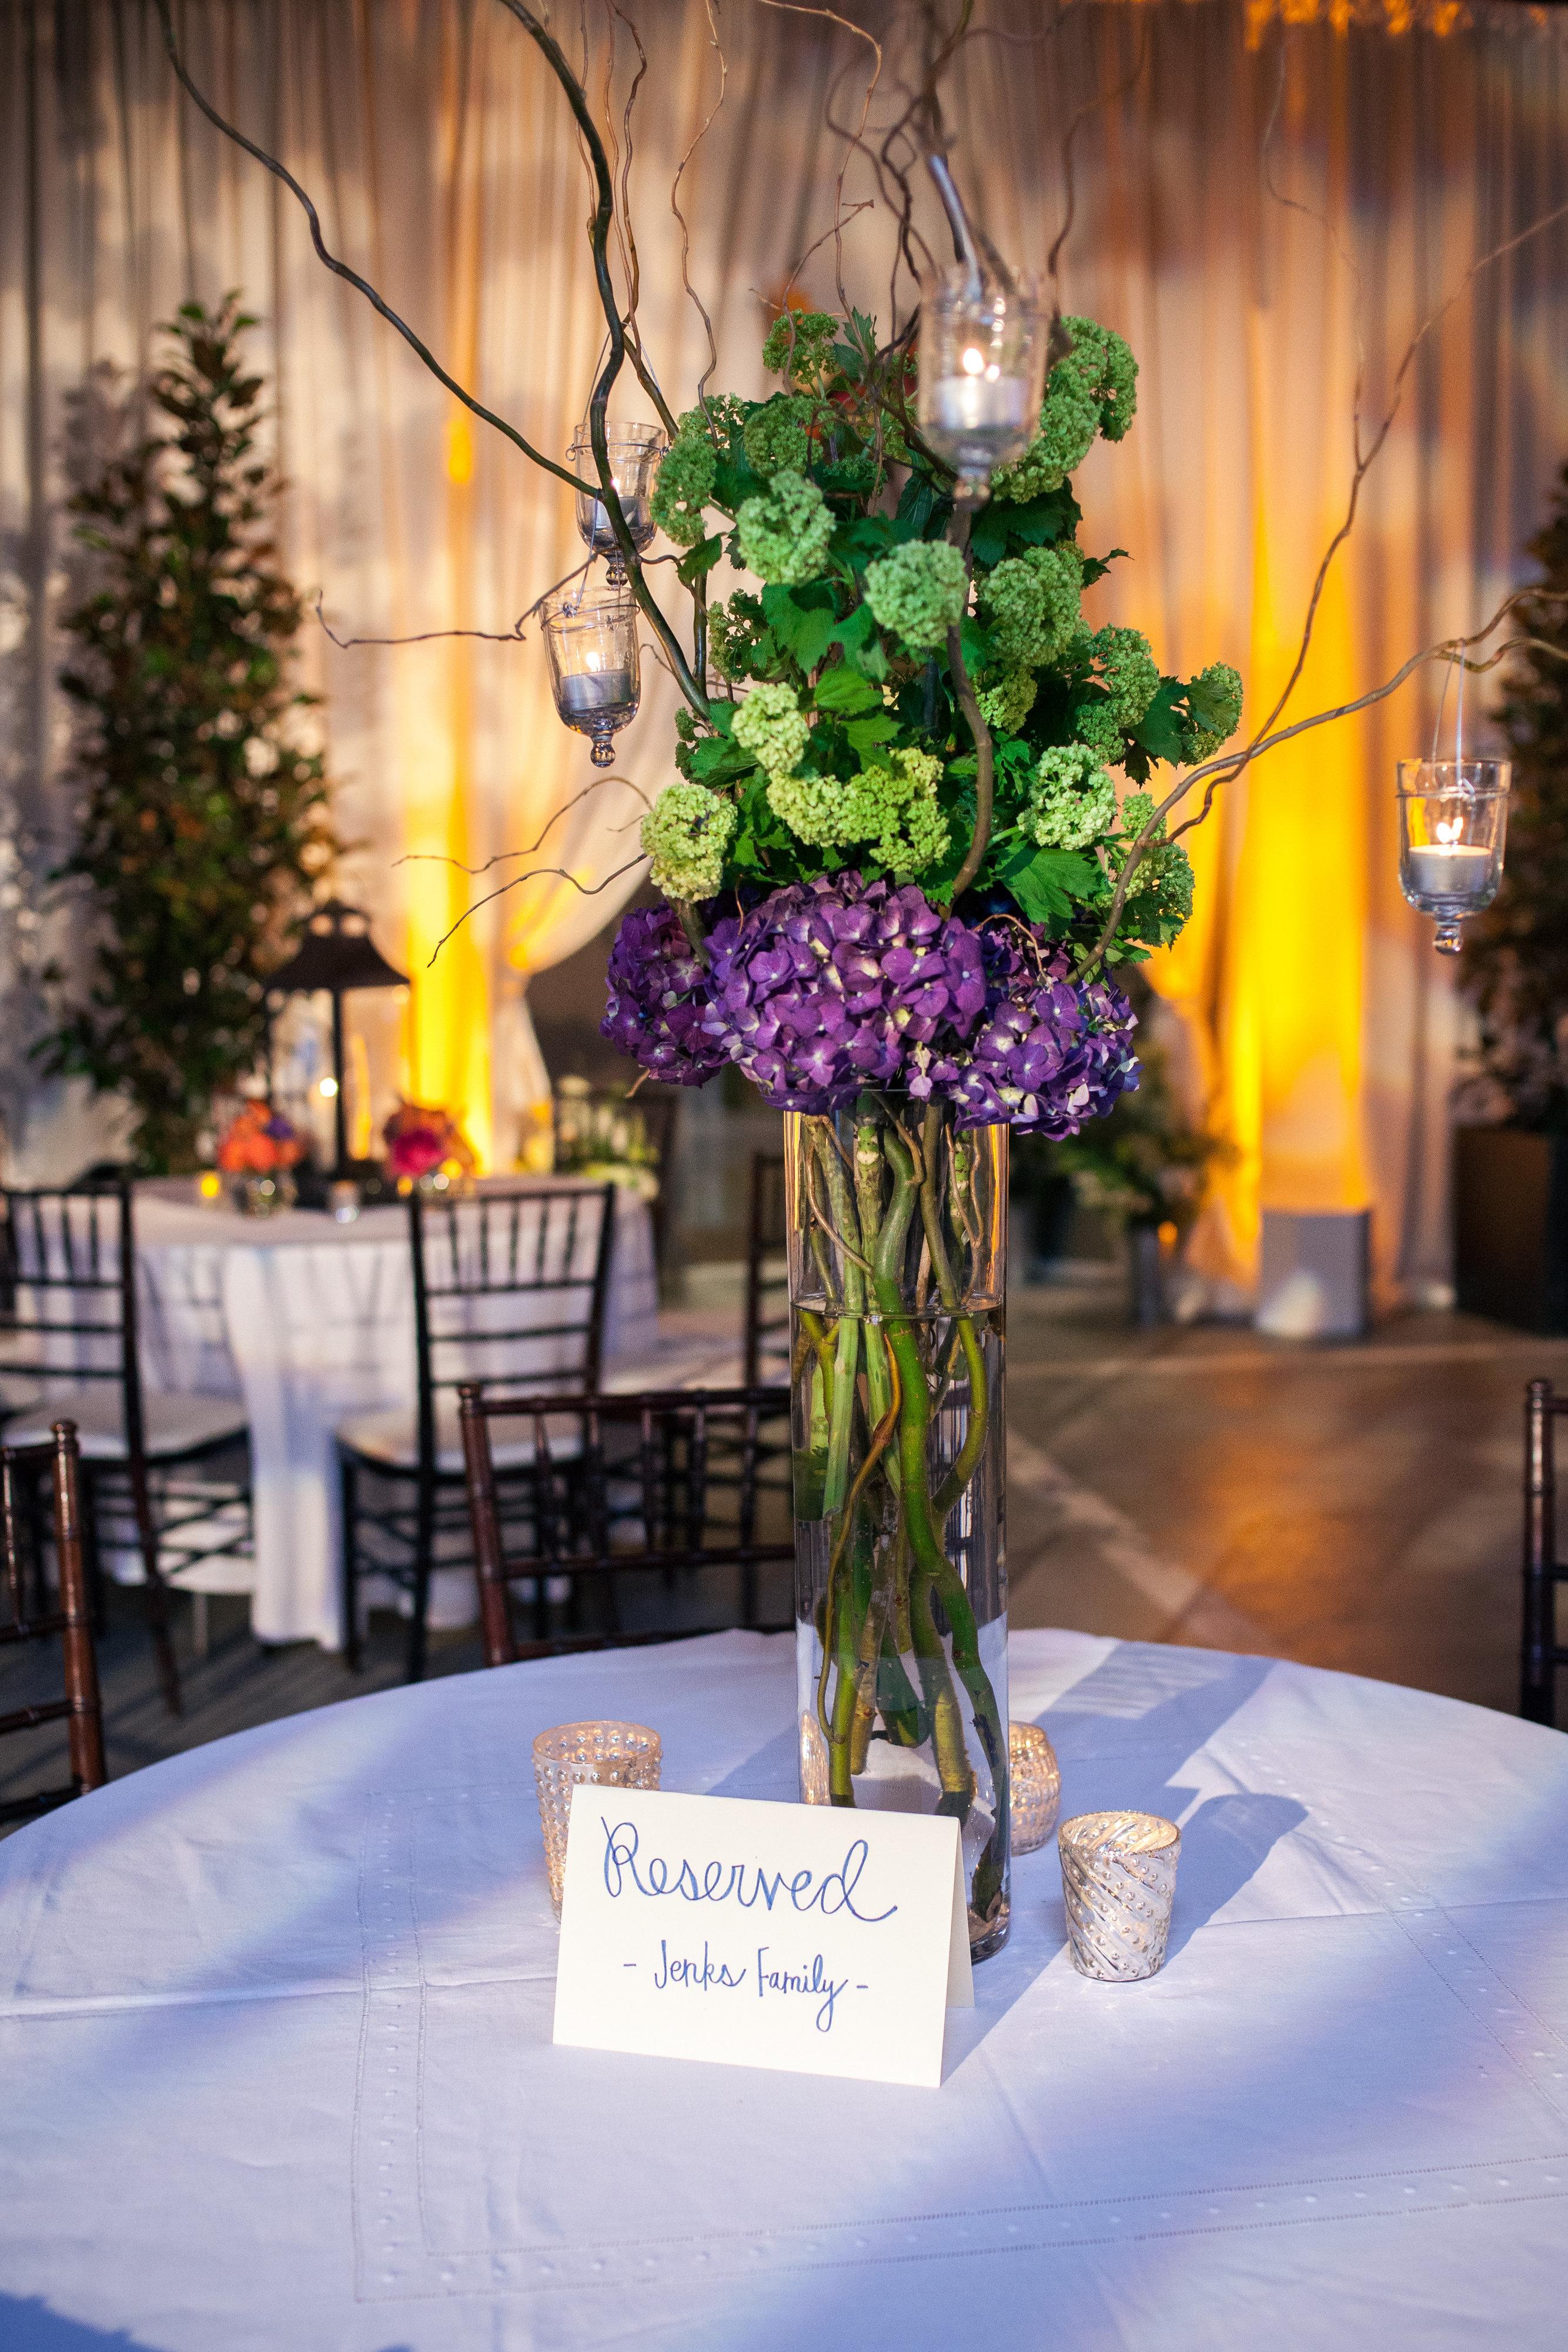 Ross Jenks Wedding-Reception Photos-0010